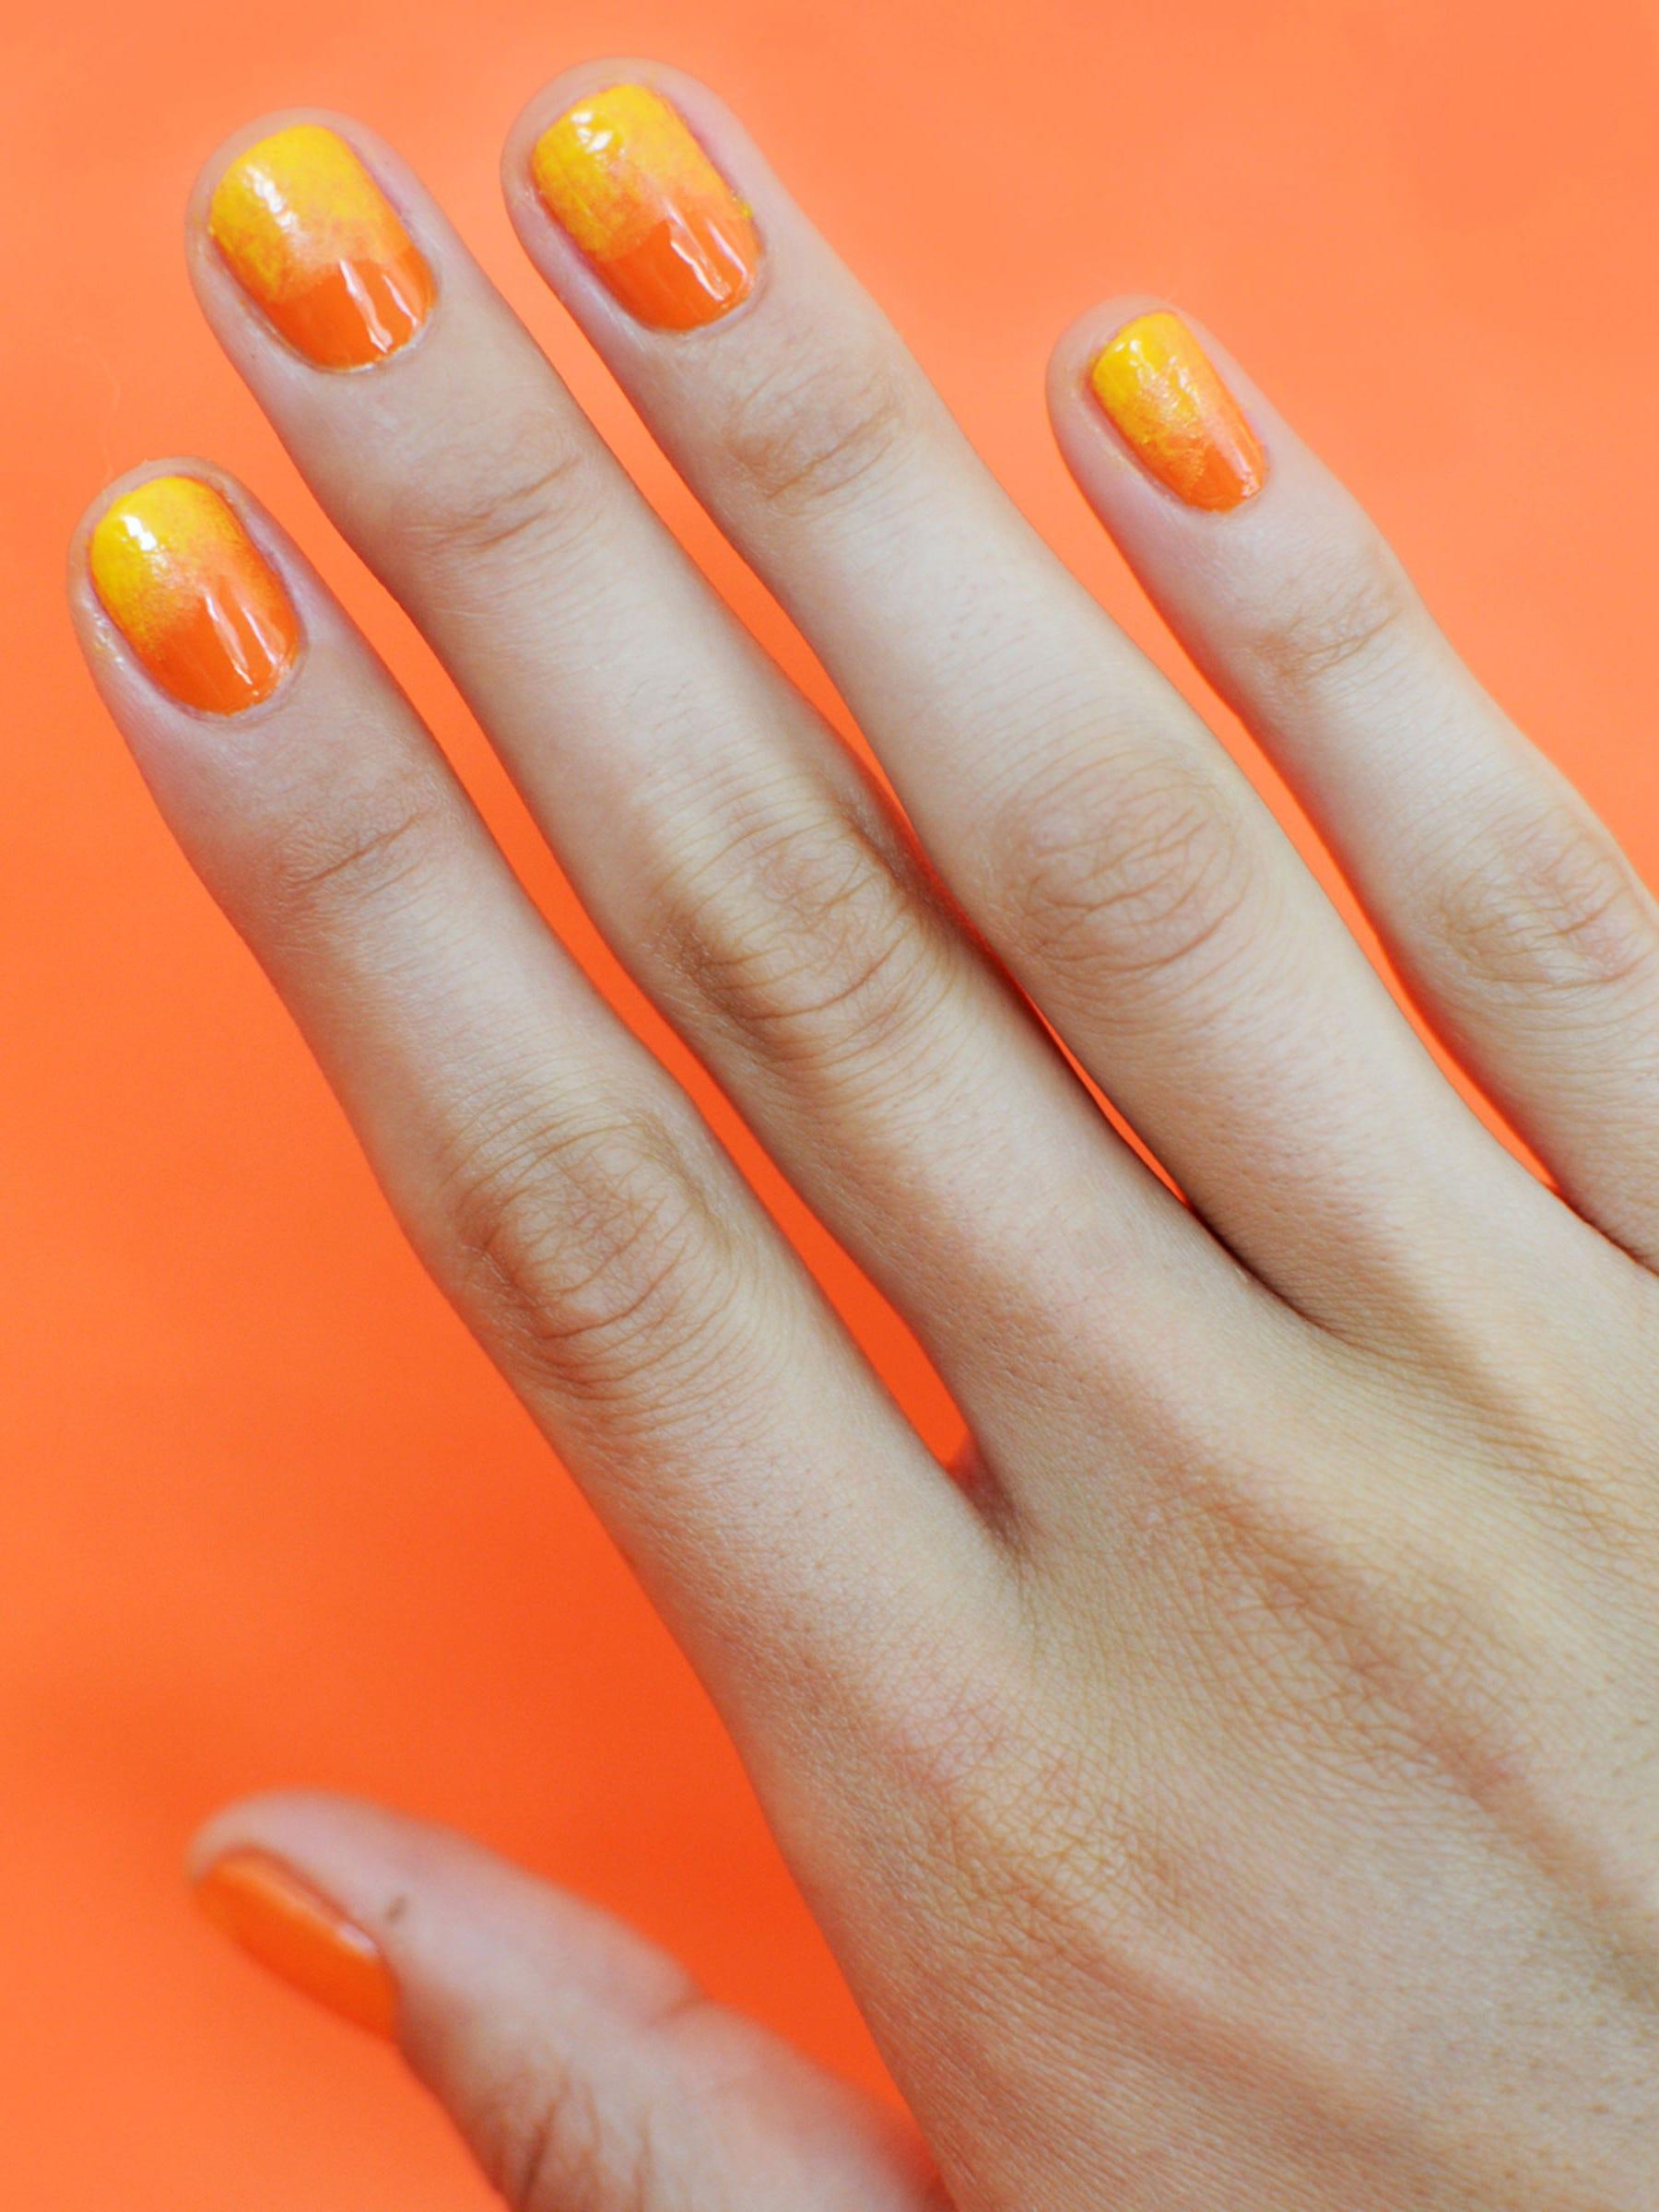 Halloween nails designs inspiration photos ideas prinsesfo Choice Image